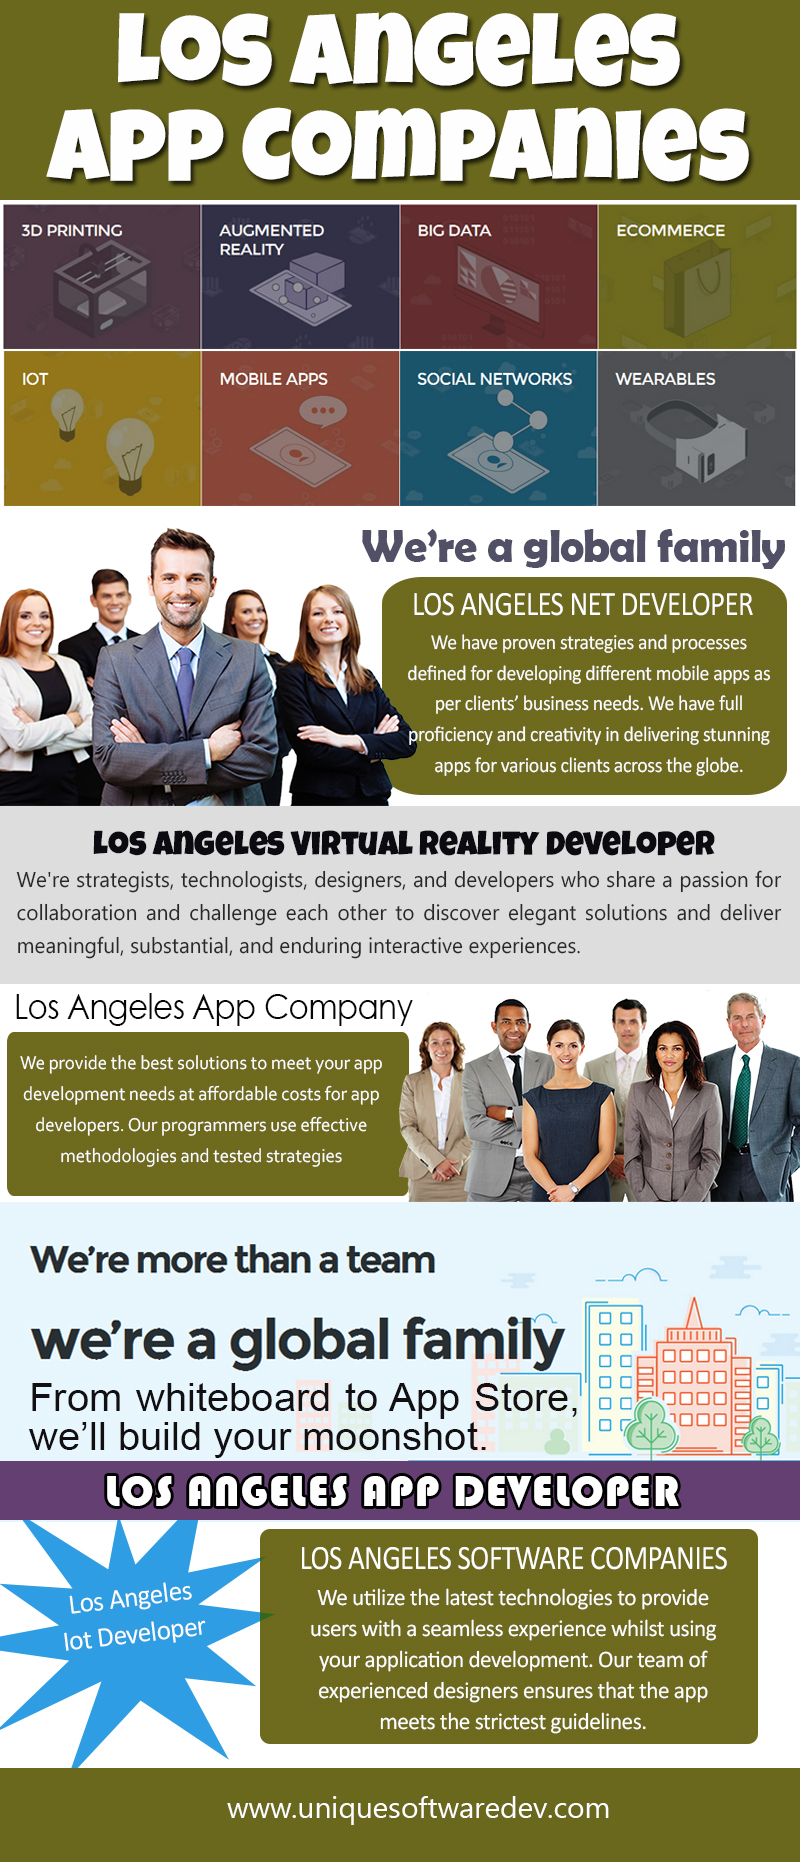 Los Angeles App Developer